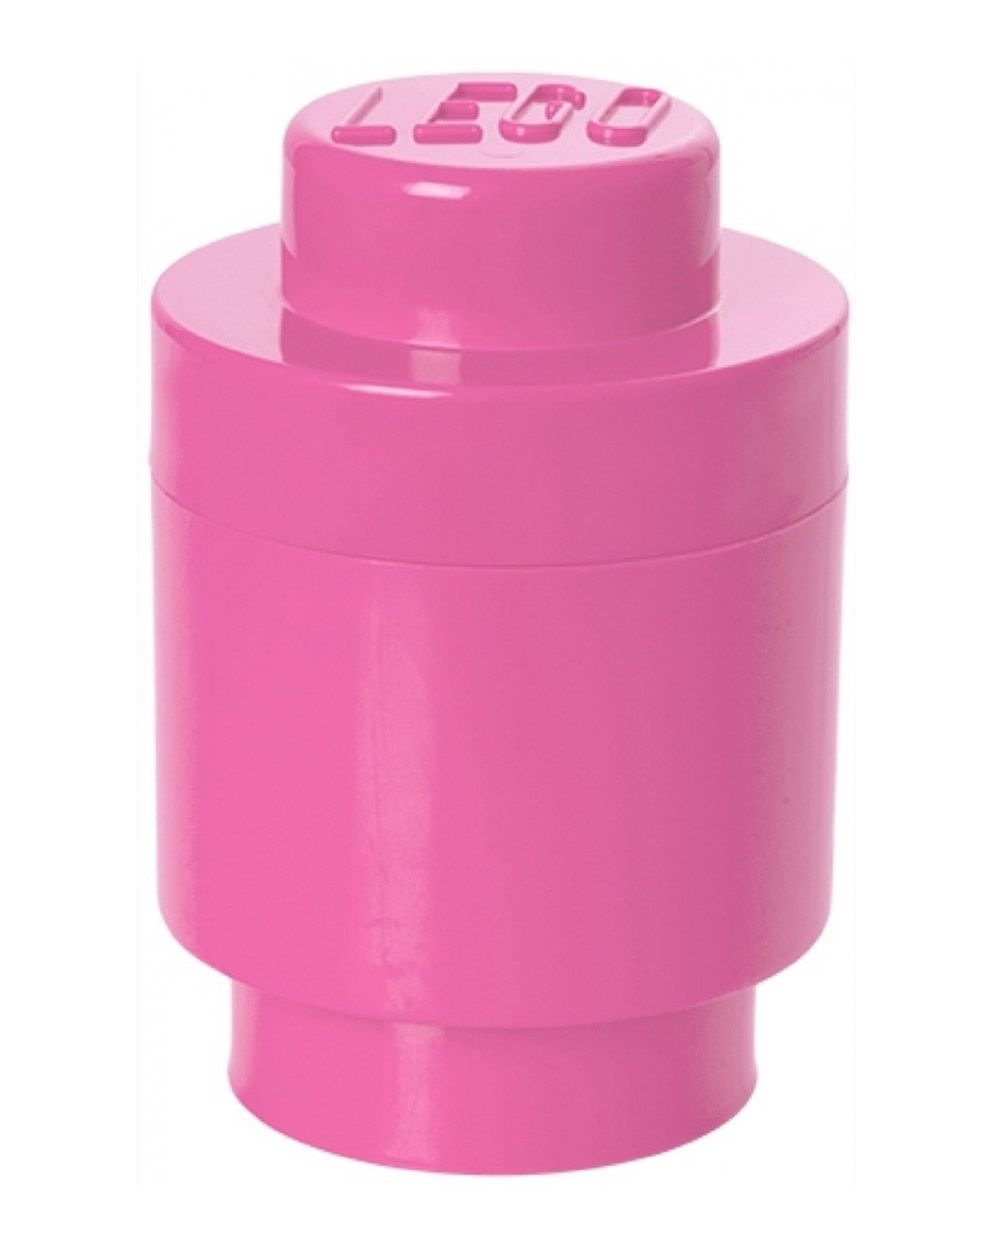 Boite ronde rose plot lego rangement with boite rangement - Boite de rangement lego pas cher ...